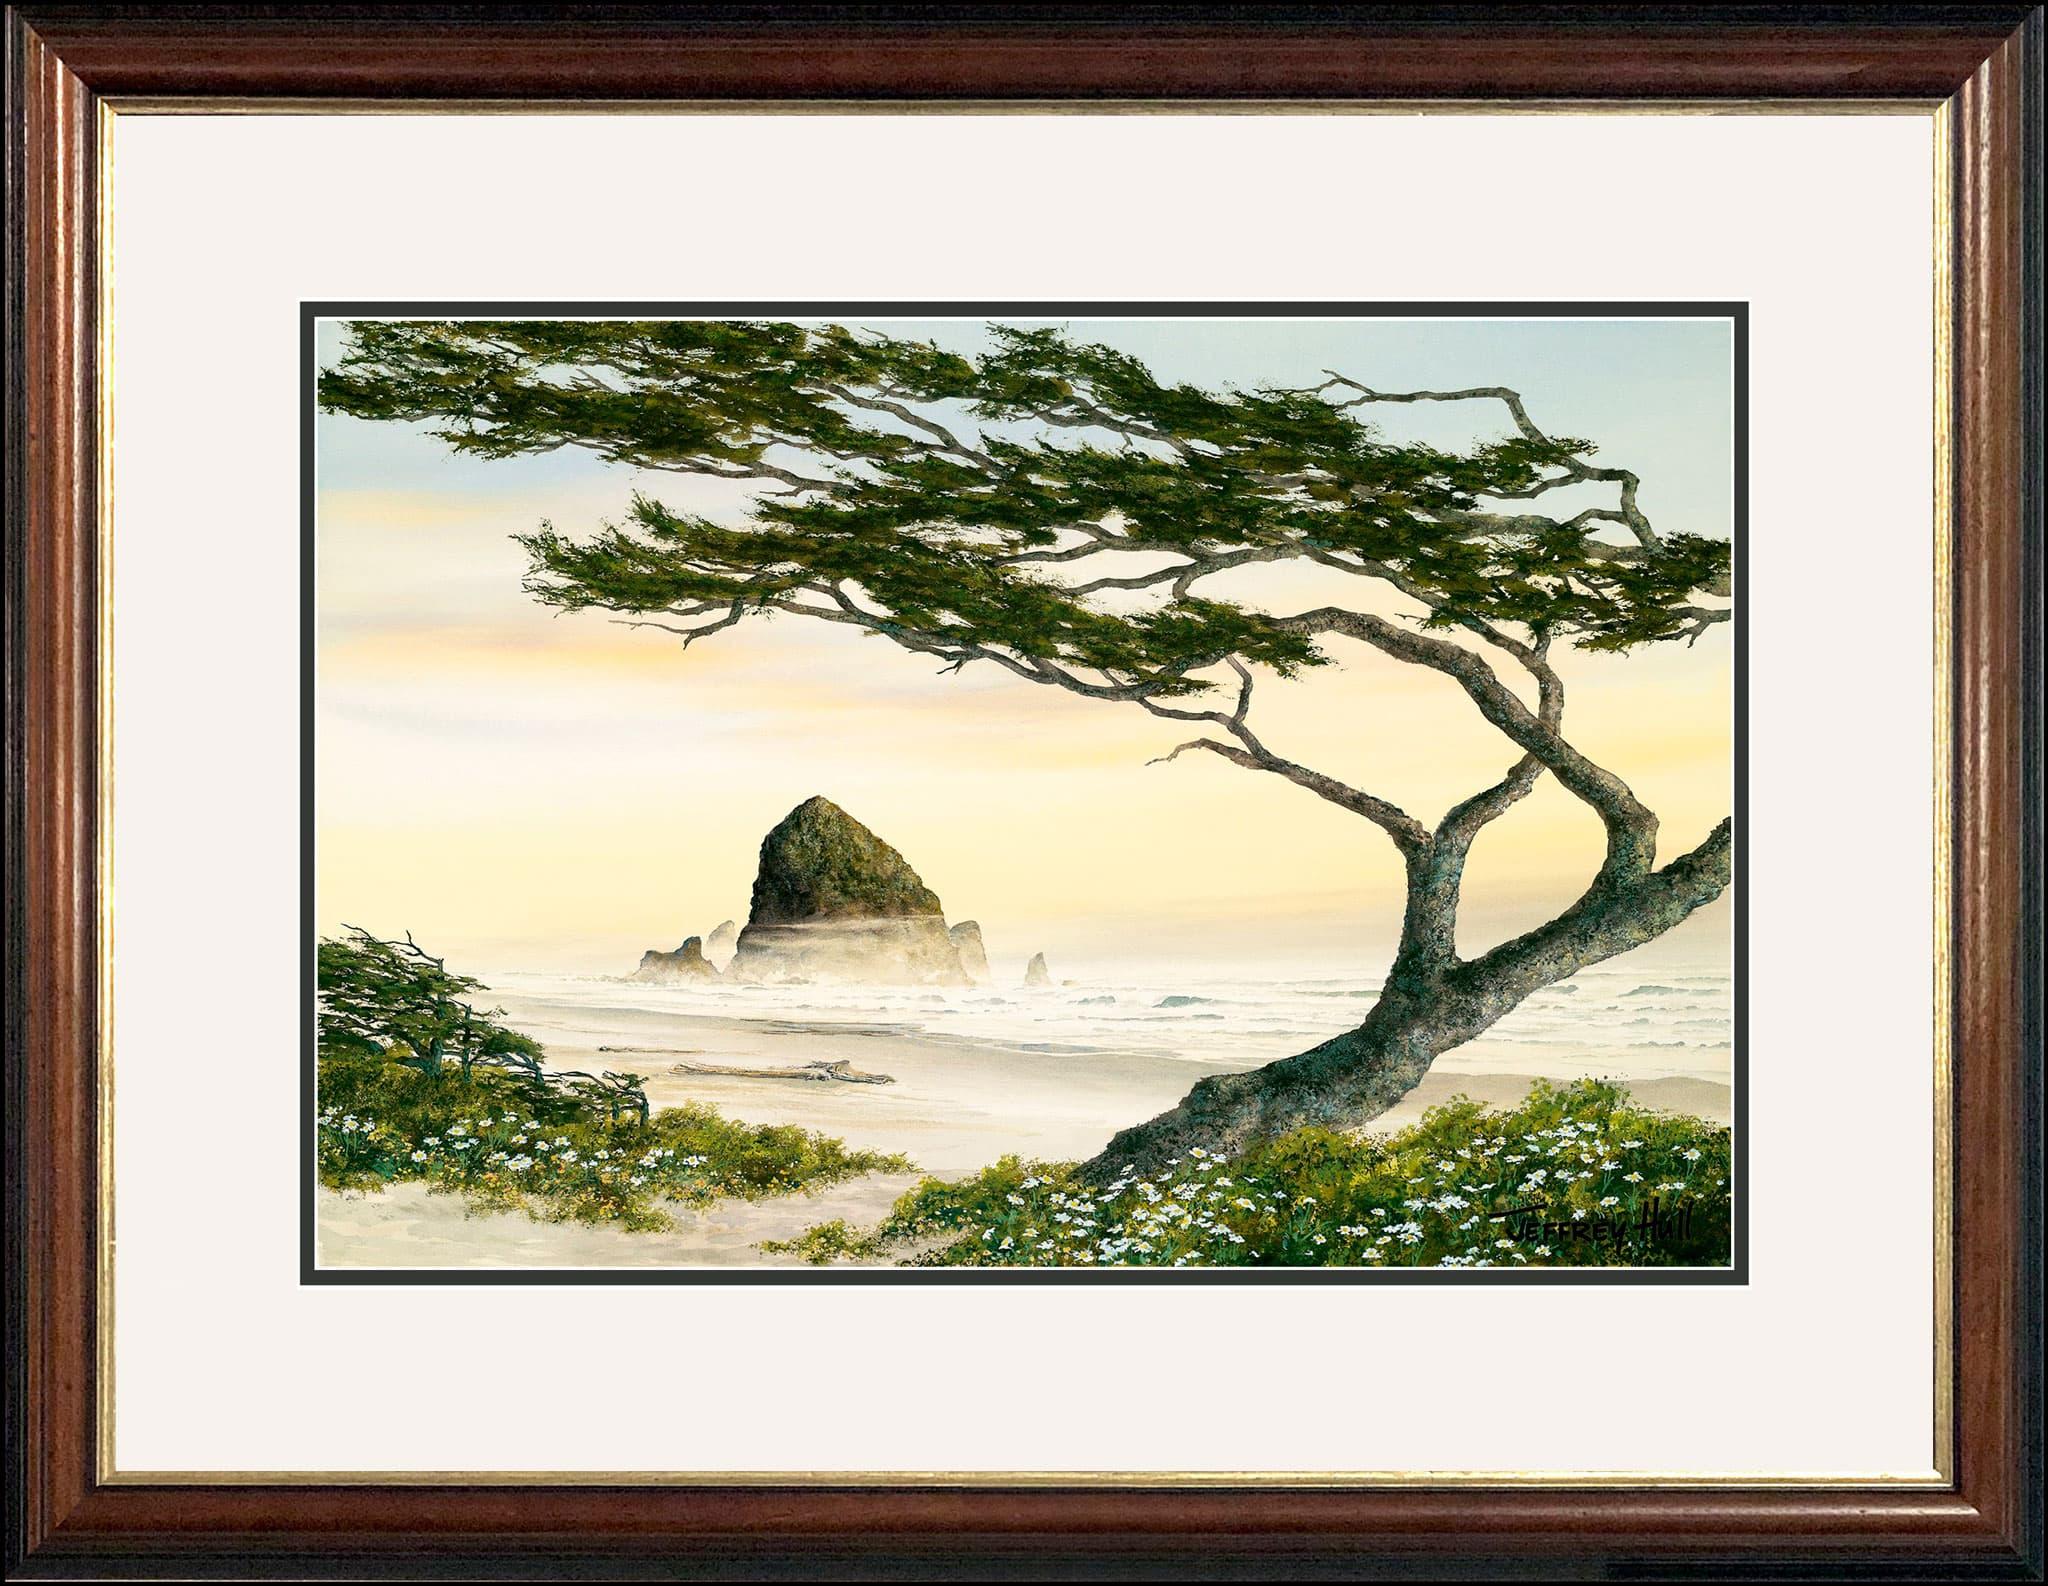 The-Wedding-Tree-LimEd-Malabar-Talc-Dark-Shale-4-Website-2021